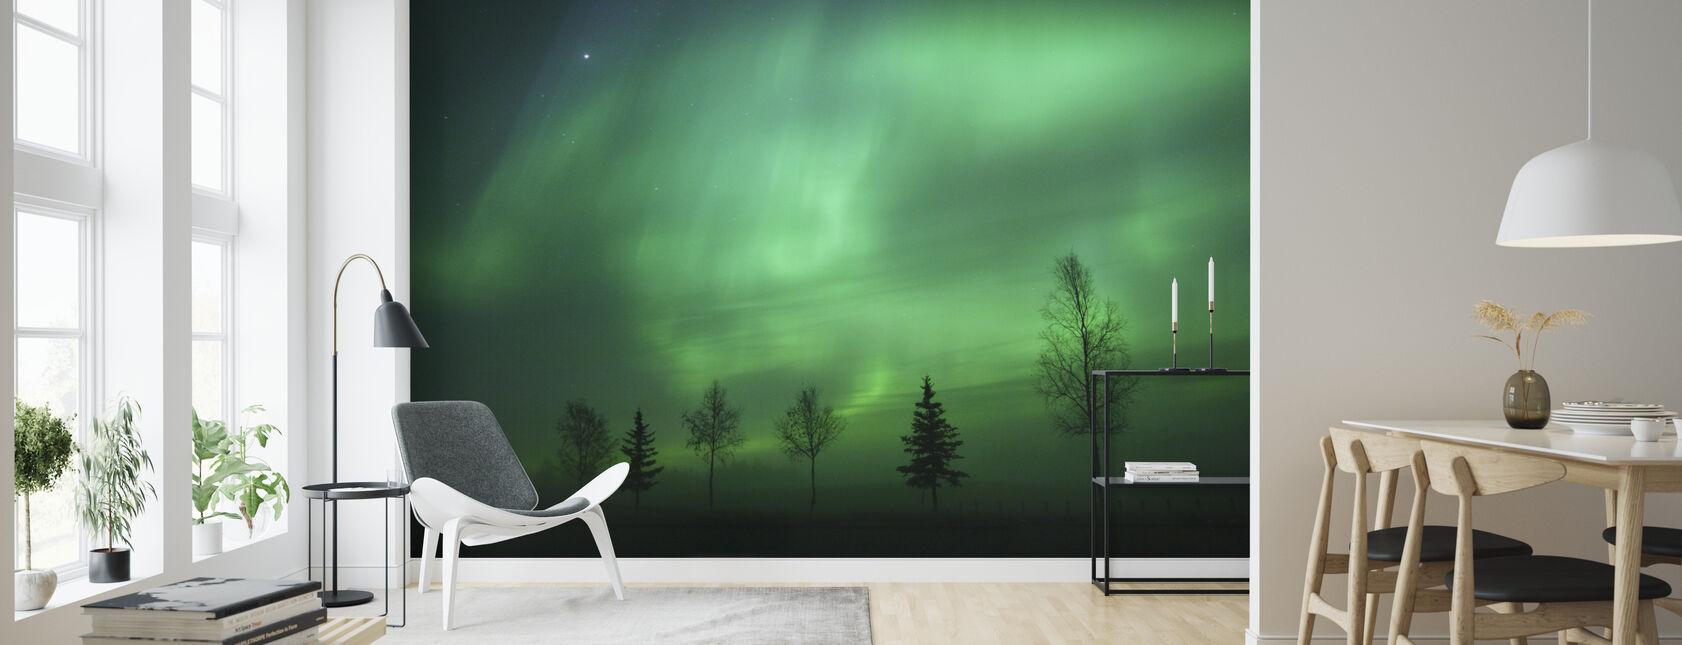 Nordisk lys - Tapet - Stue